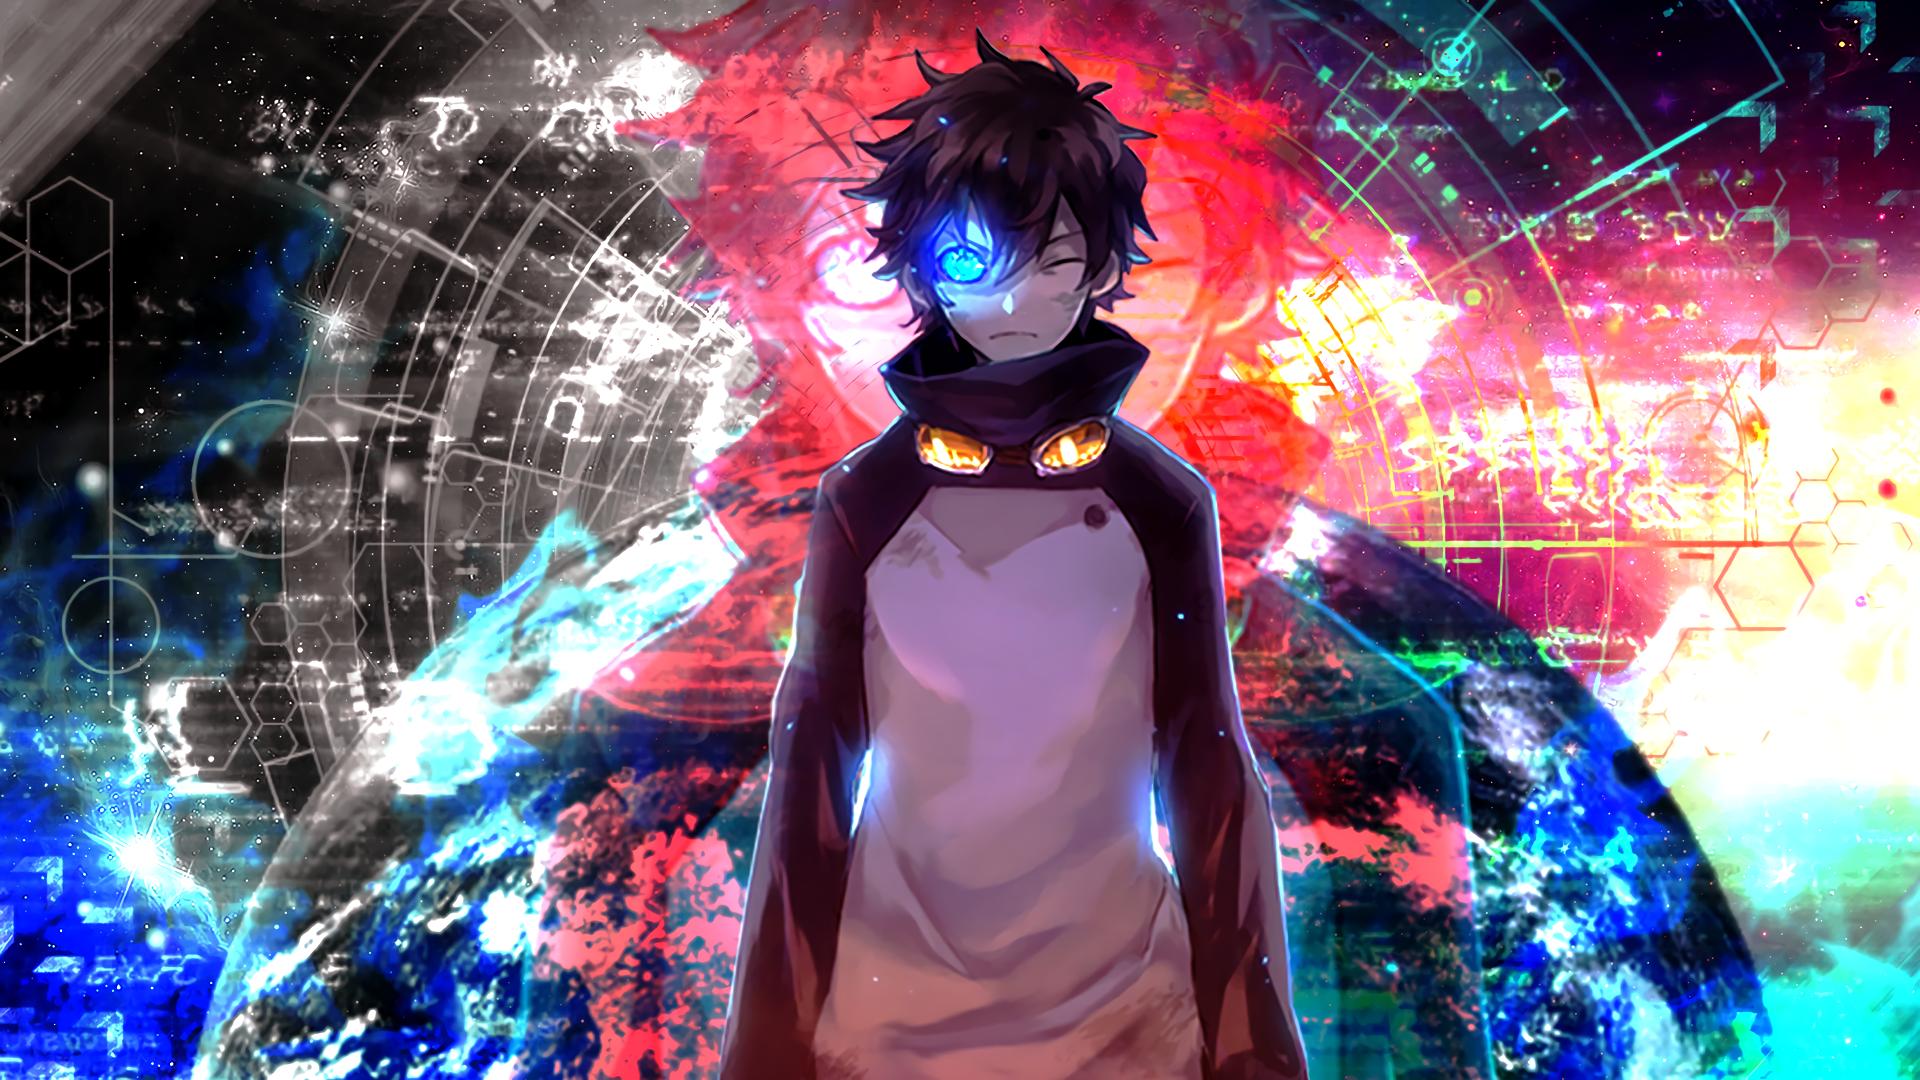 Fondos De Pantalla : Anime, Ojos Azules, Chicos Anime